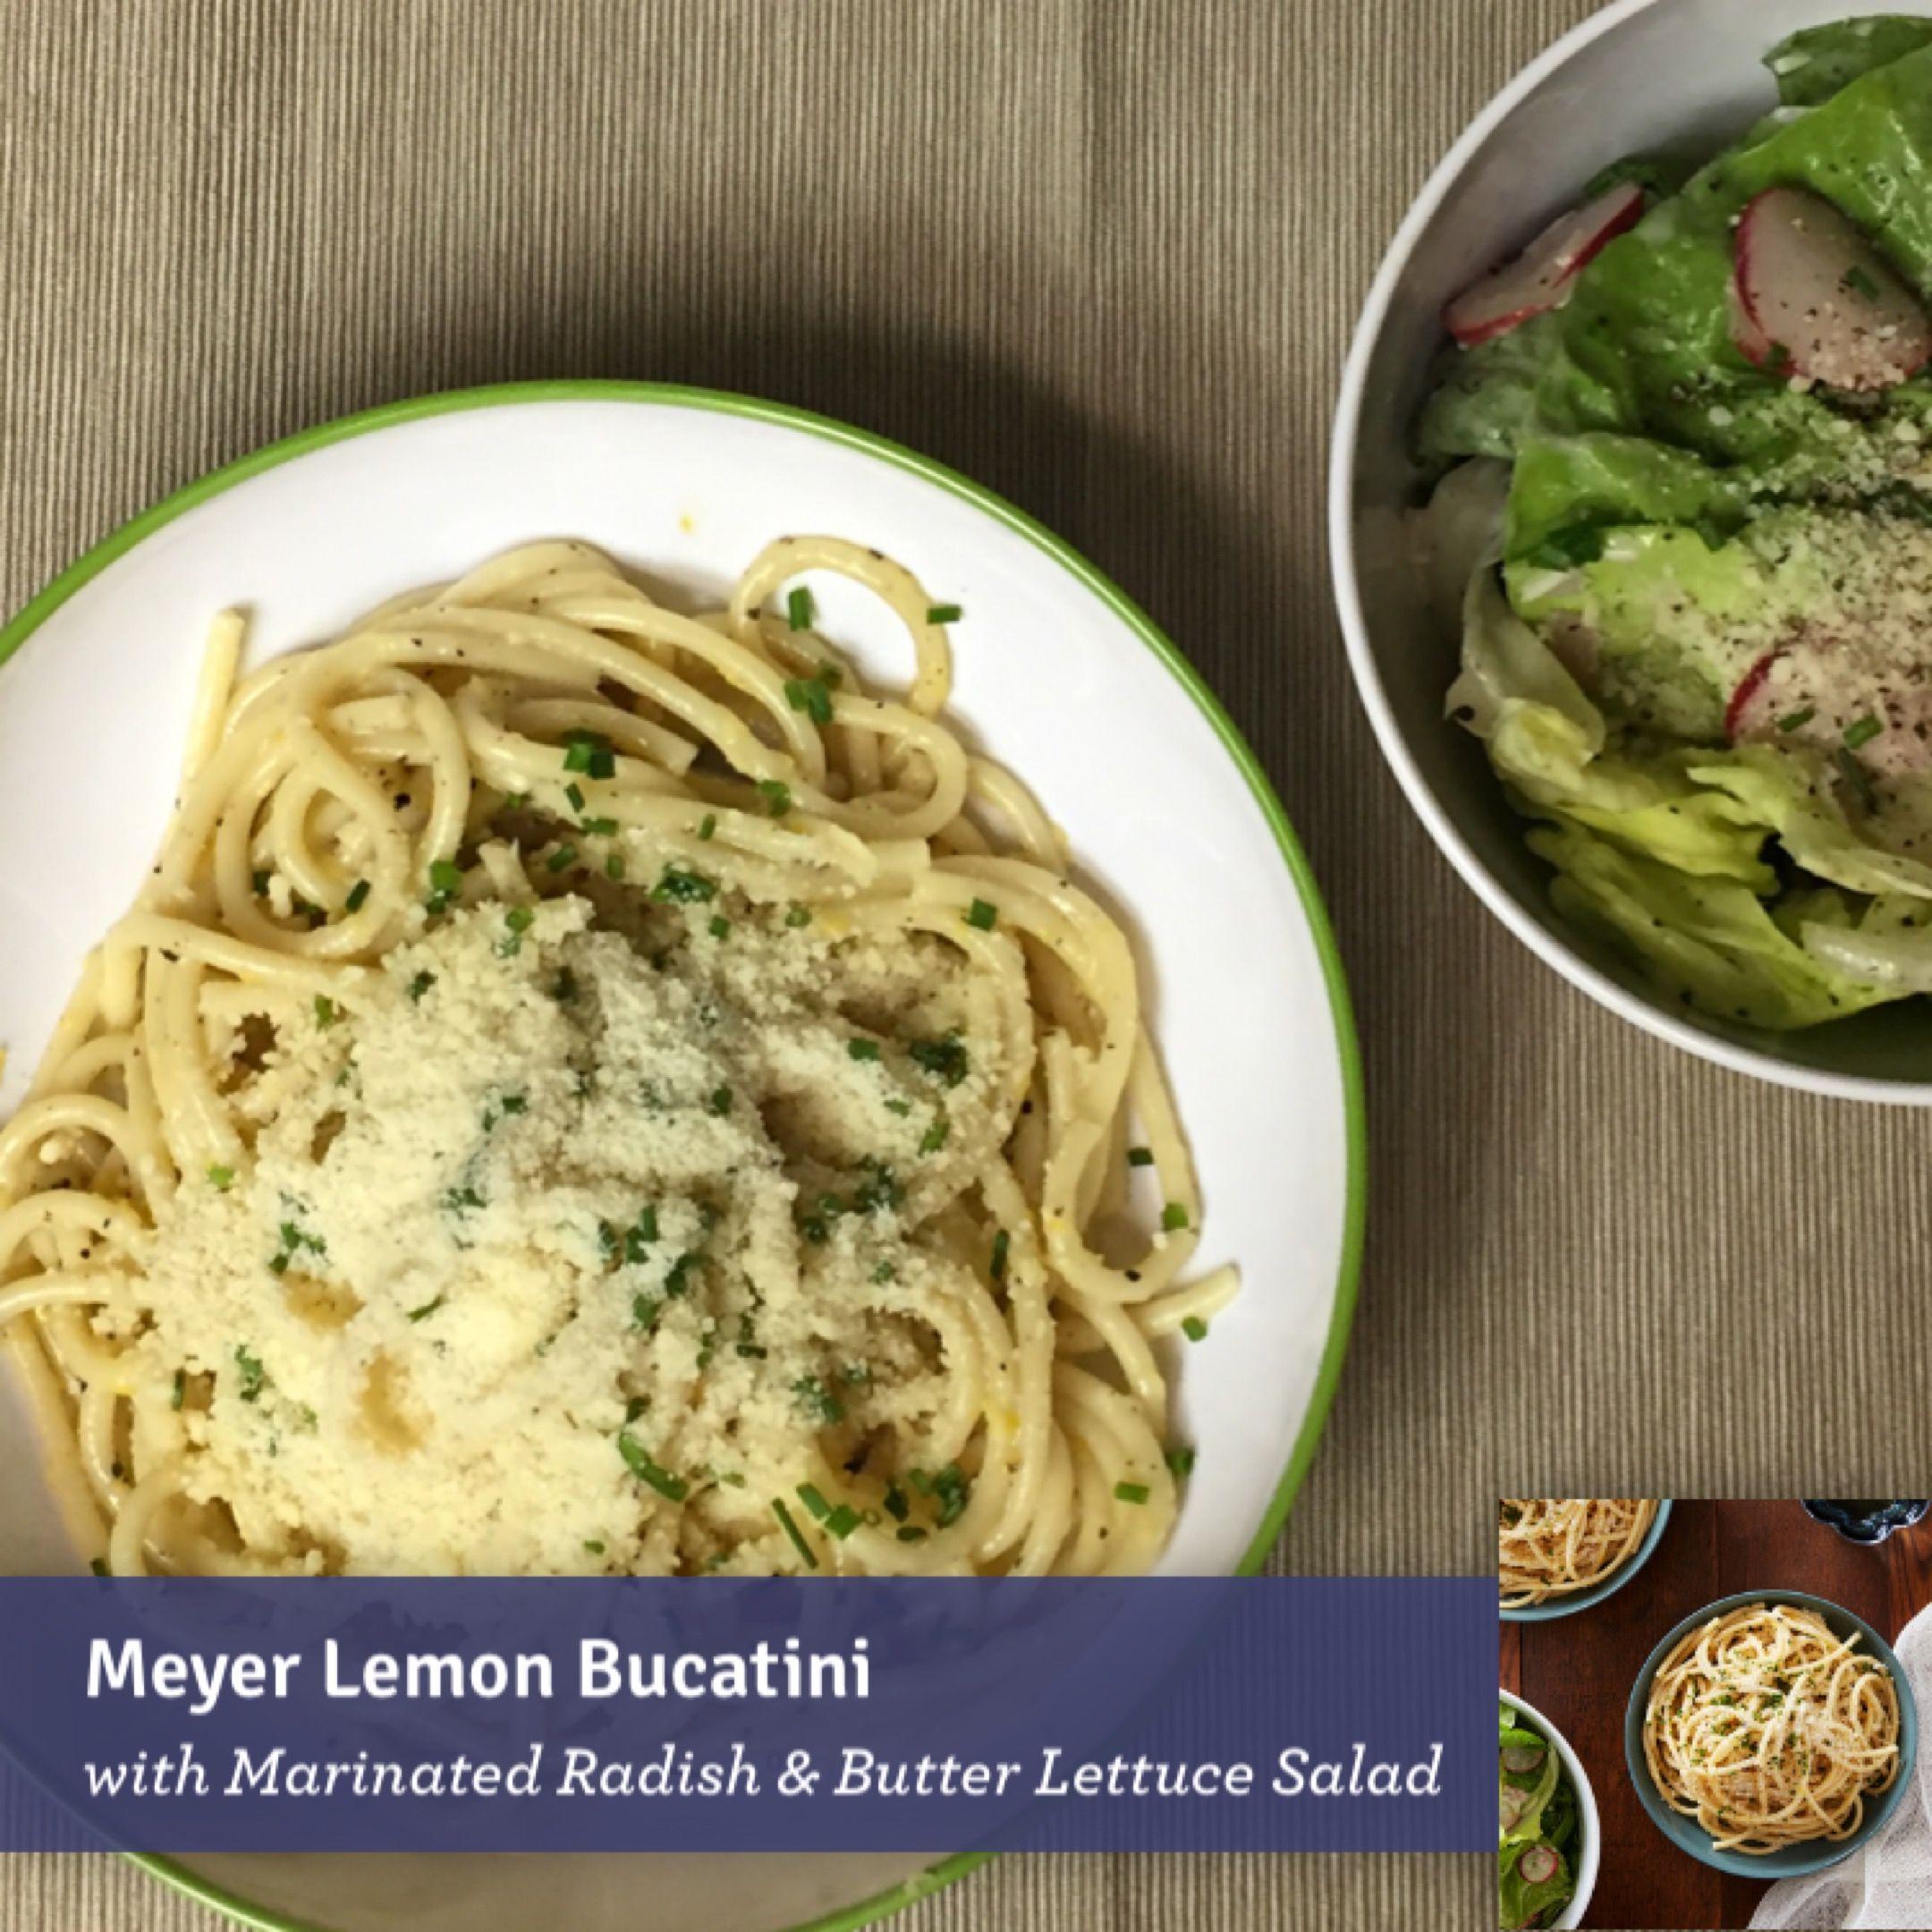 Blue apron bucatini - Meyer Lemon Bucatini With Marinated Radish Butter Lettuce Salad Blueapron